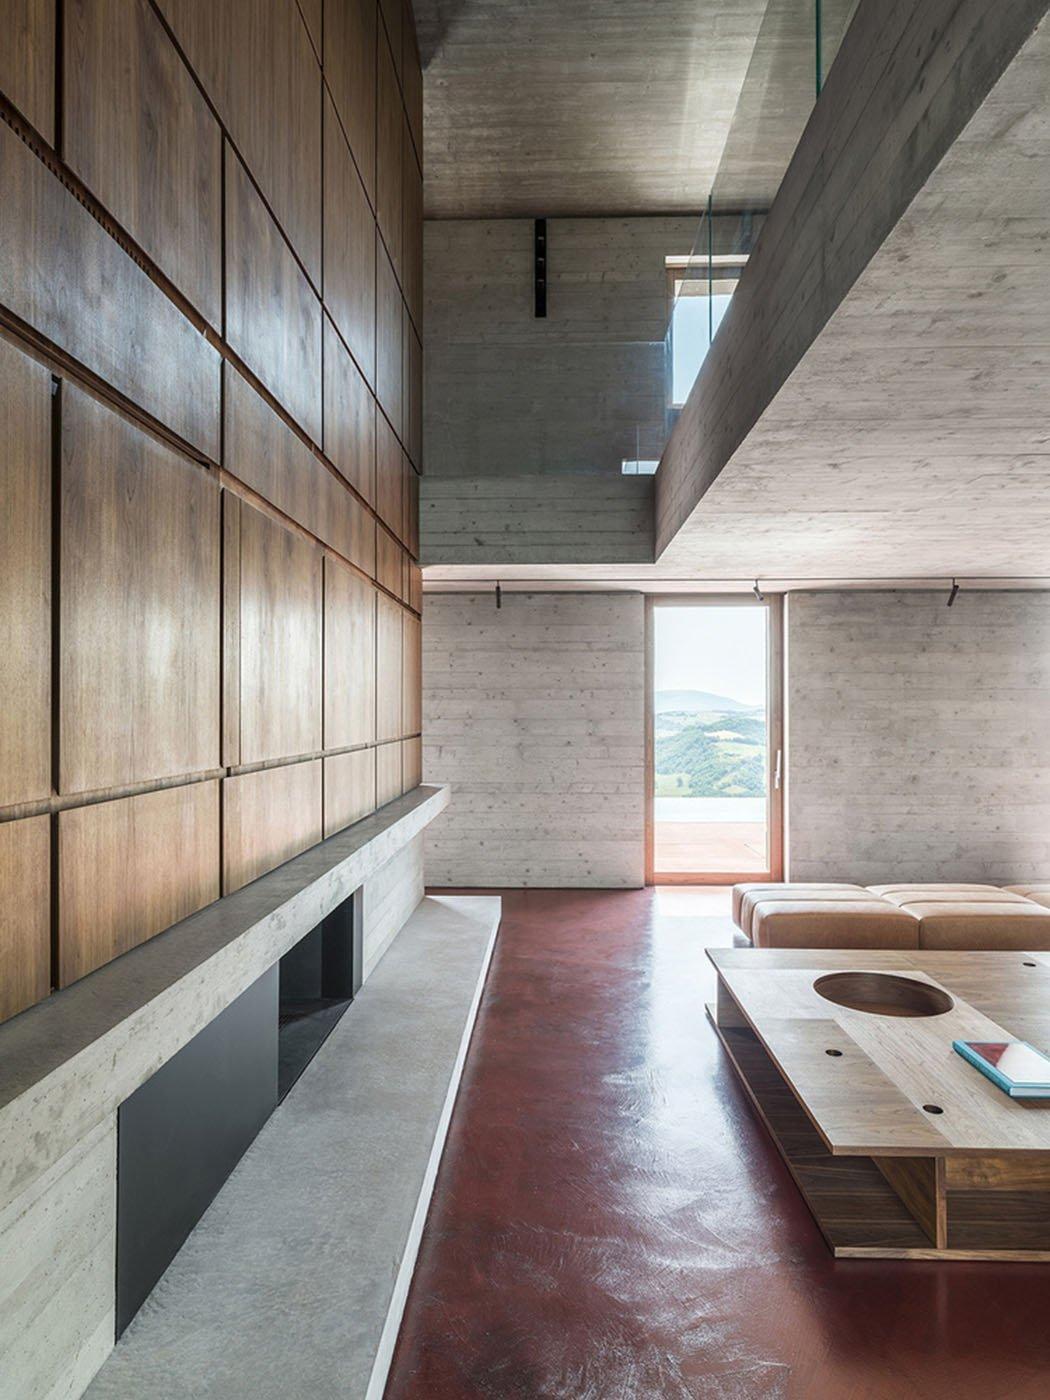 Architecture_APHouse_GGAGardiniGibertiniArchitects_17